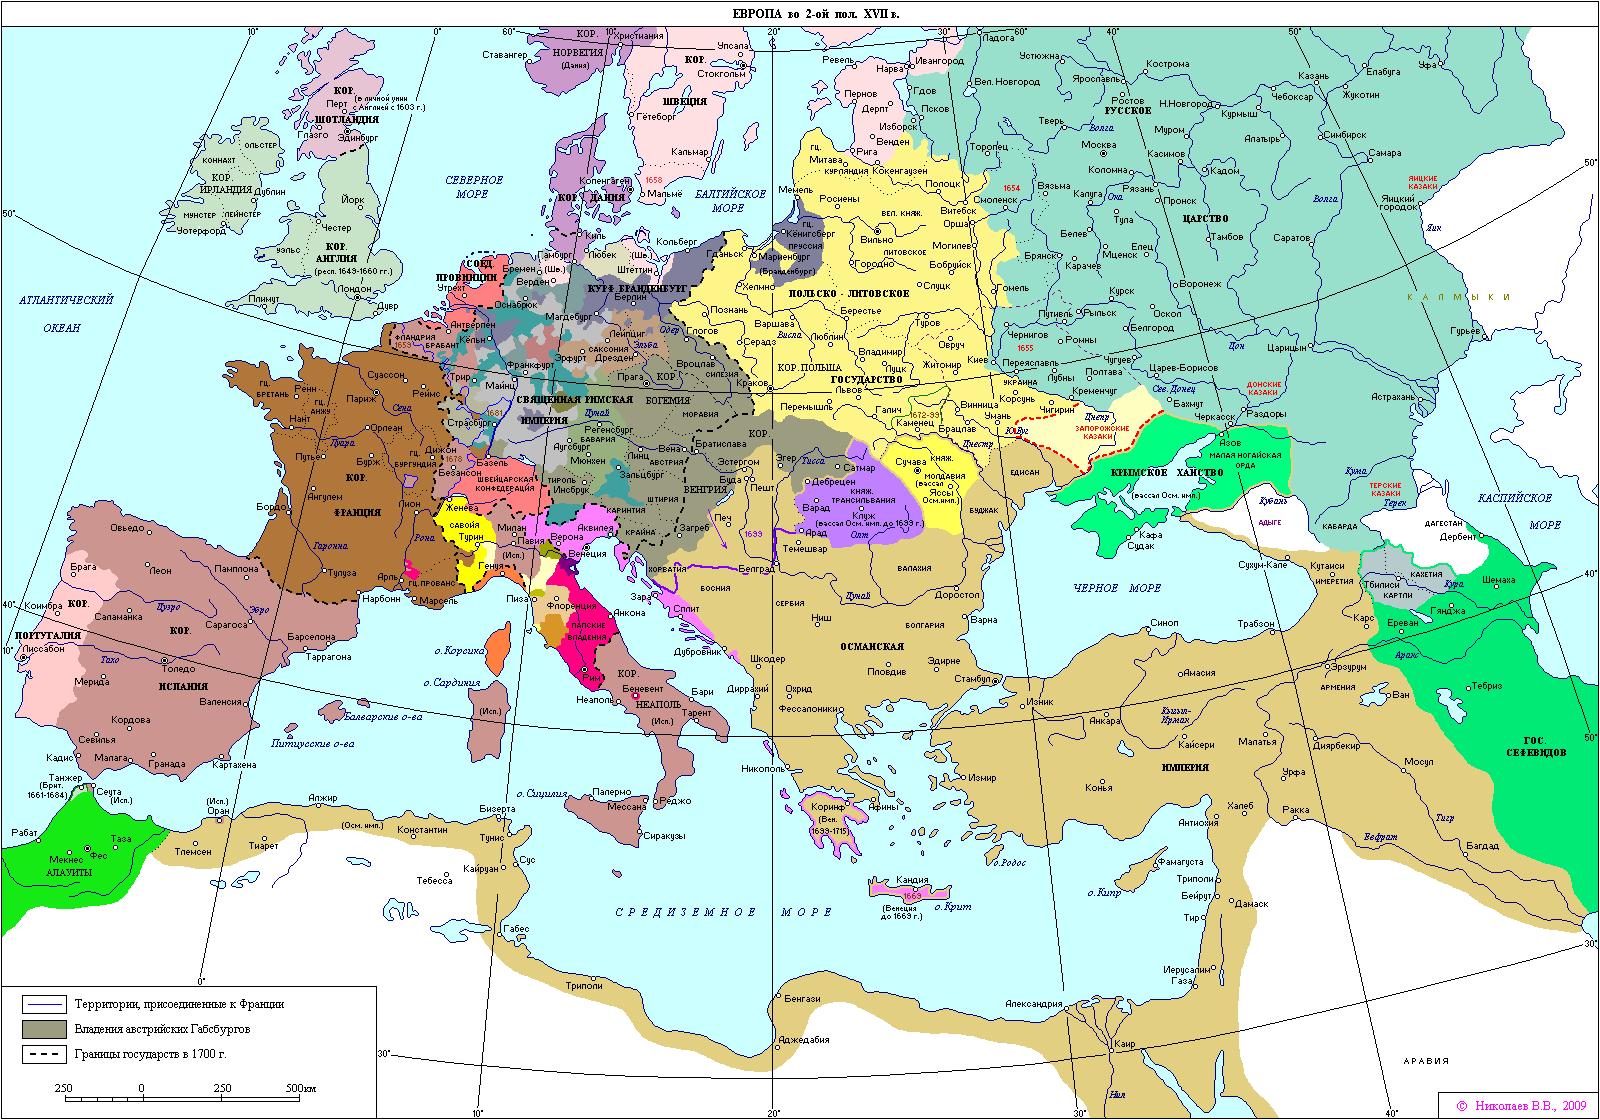 043-europe1650-1700